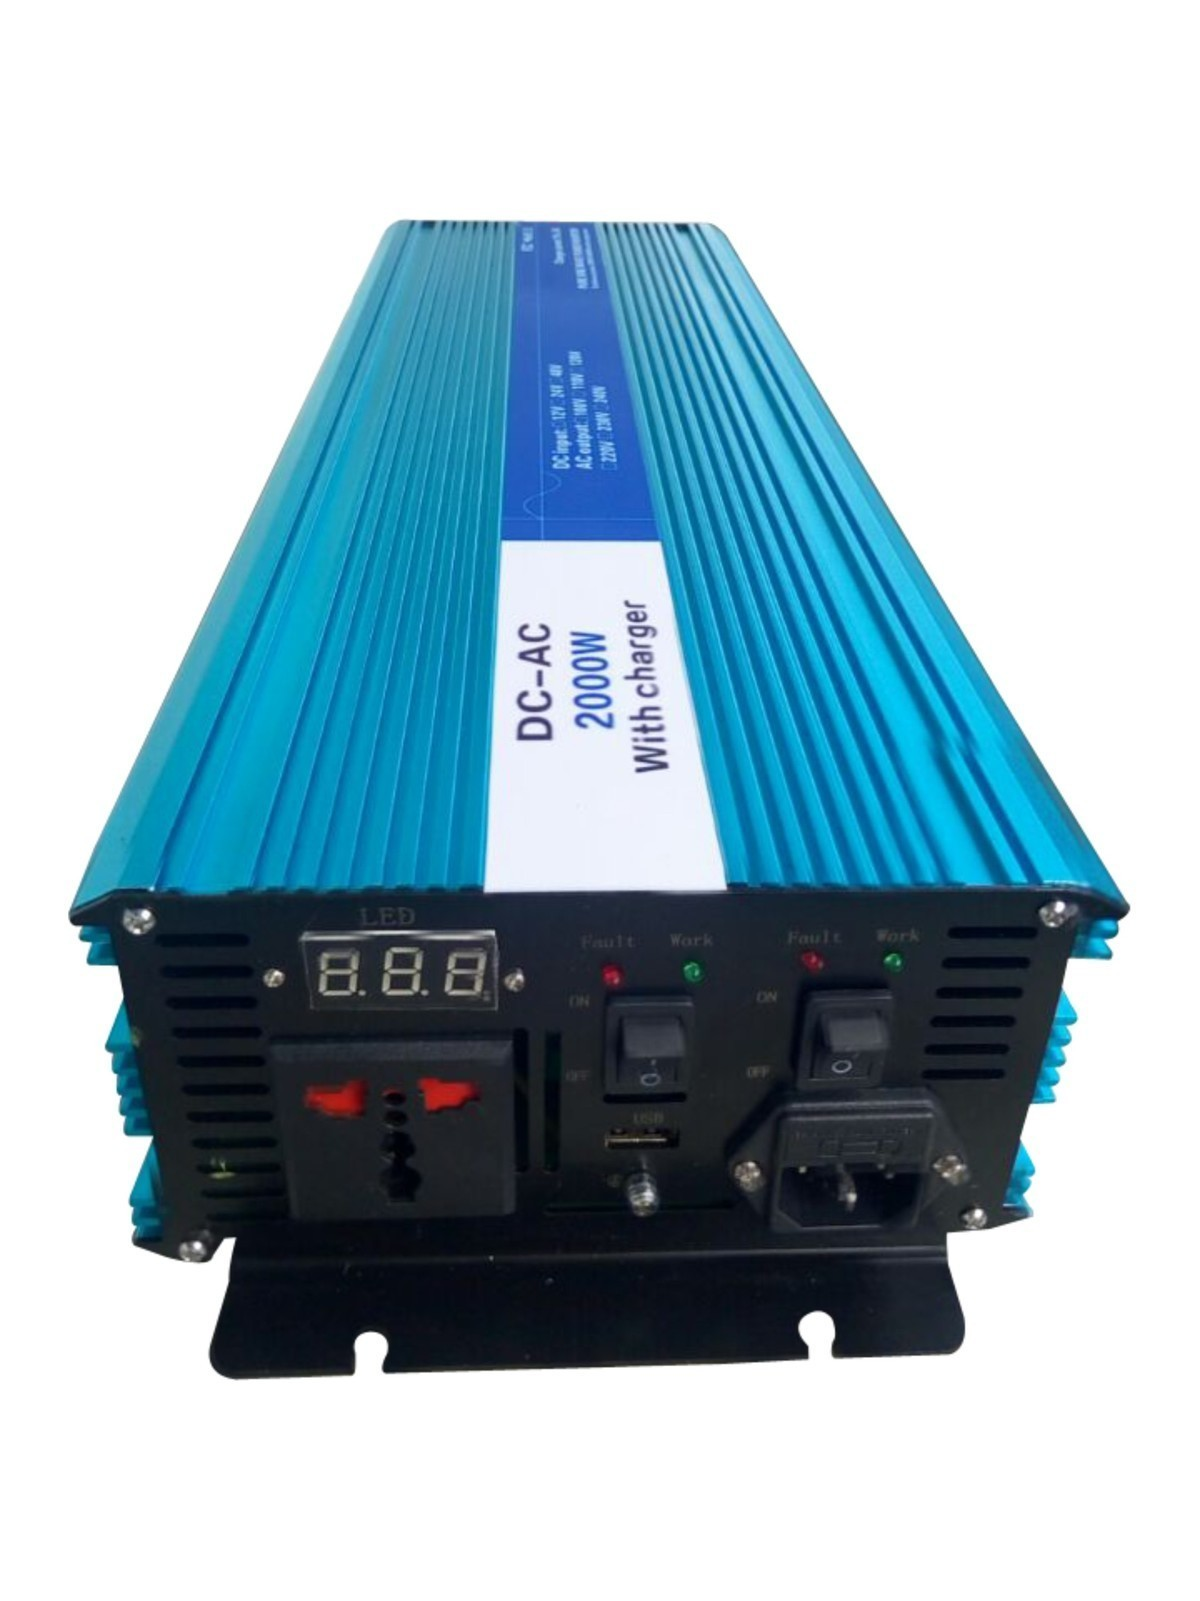 Home Improvement Intelligent Full Power 2000w Pure Sine Wave Inverter,dc 12v/24v/48v To Ac 110v/220v,off-grid Solar Inverter With Battery Charger And Ups